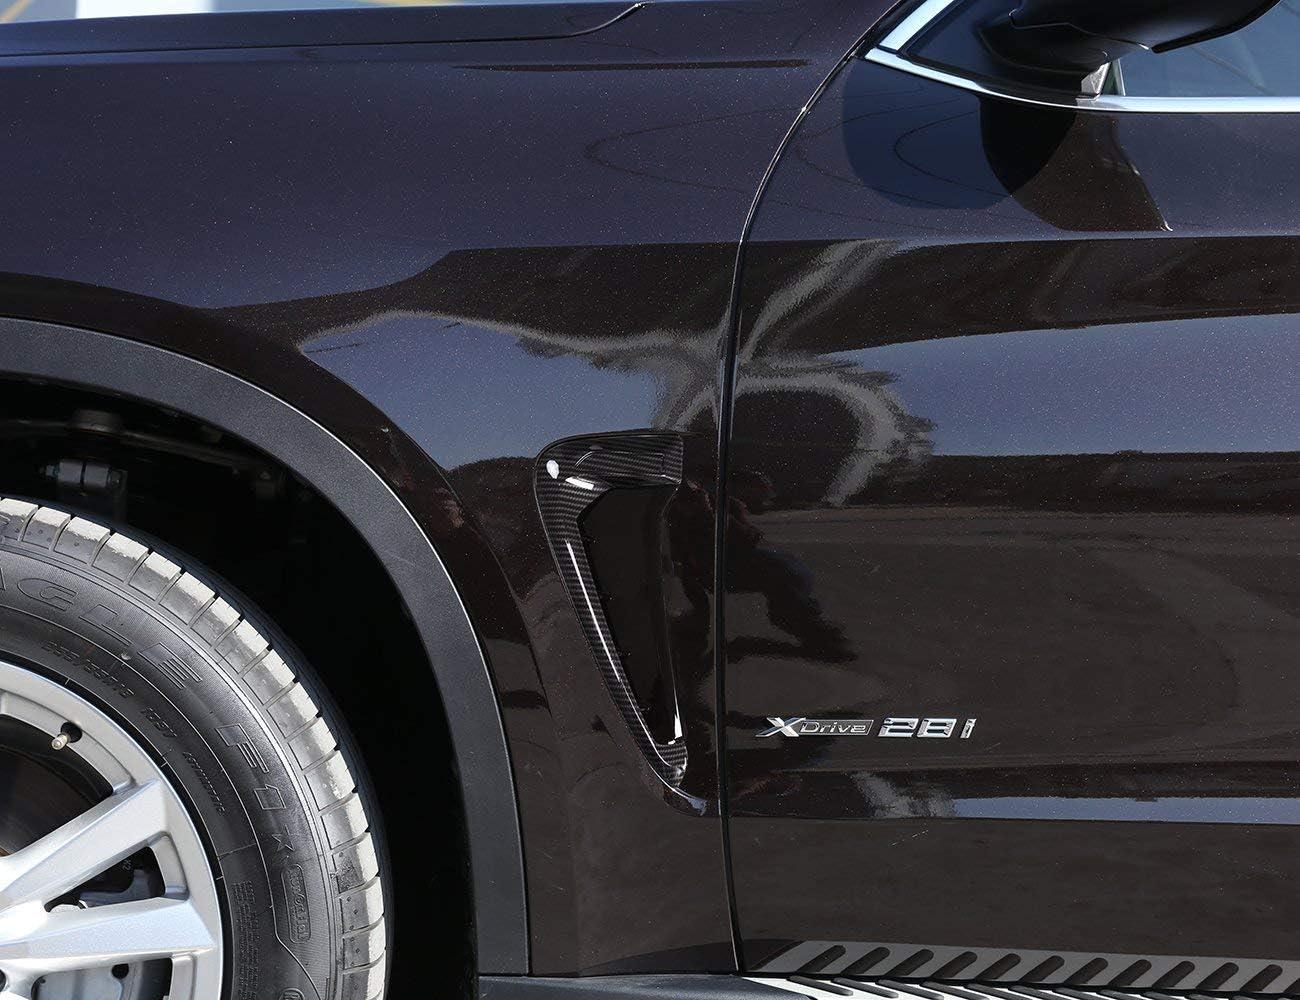 Autobro ABS Xdrive Carbon Fiber Shark Gills Side Decoration Fender Vent Trim For BMW X5 F15 X5M F85 14-17-Black White